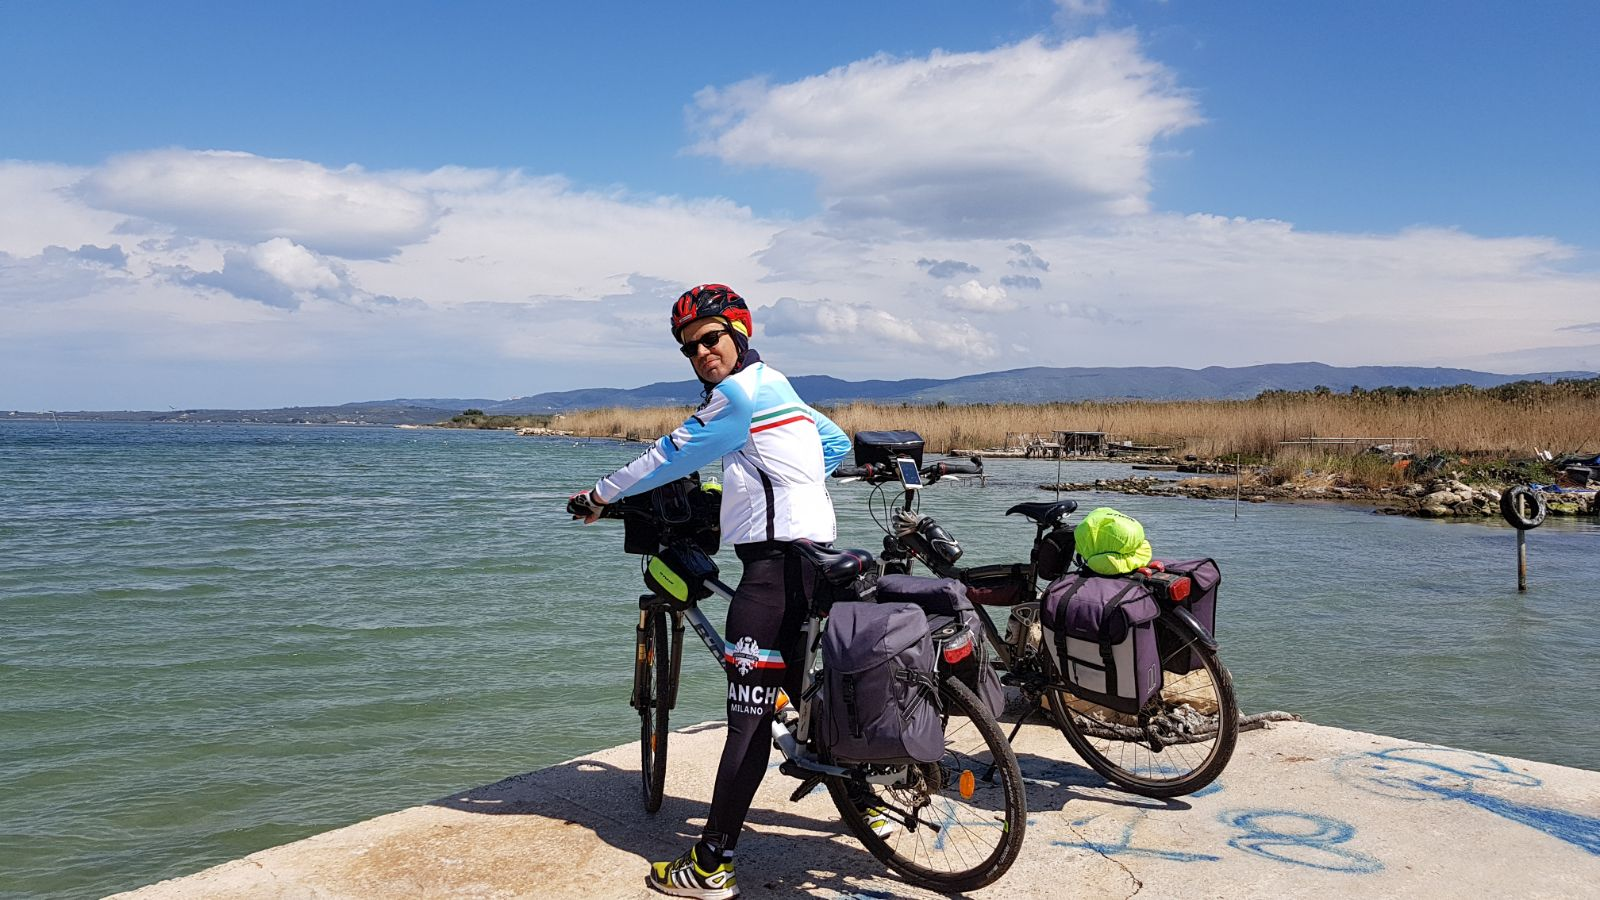 lago di varano in bici